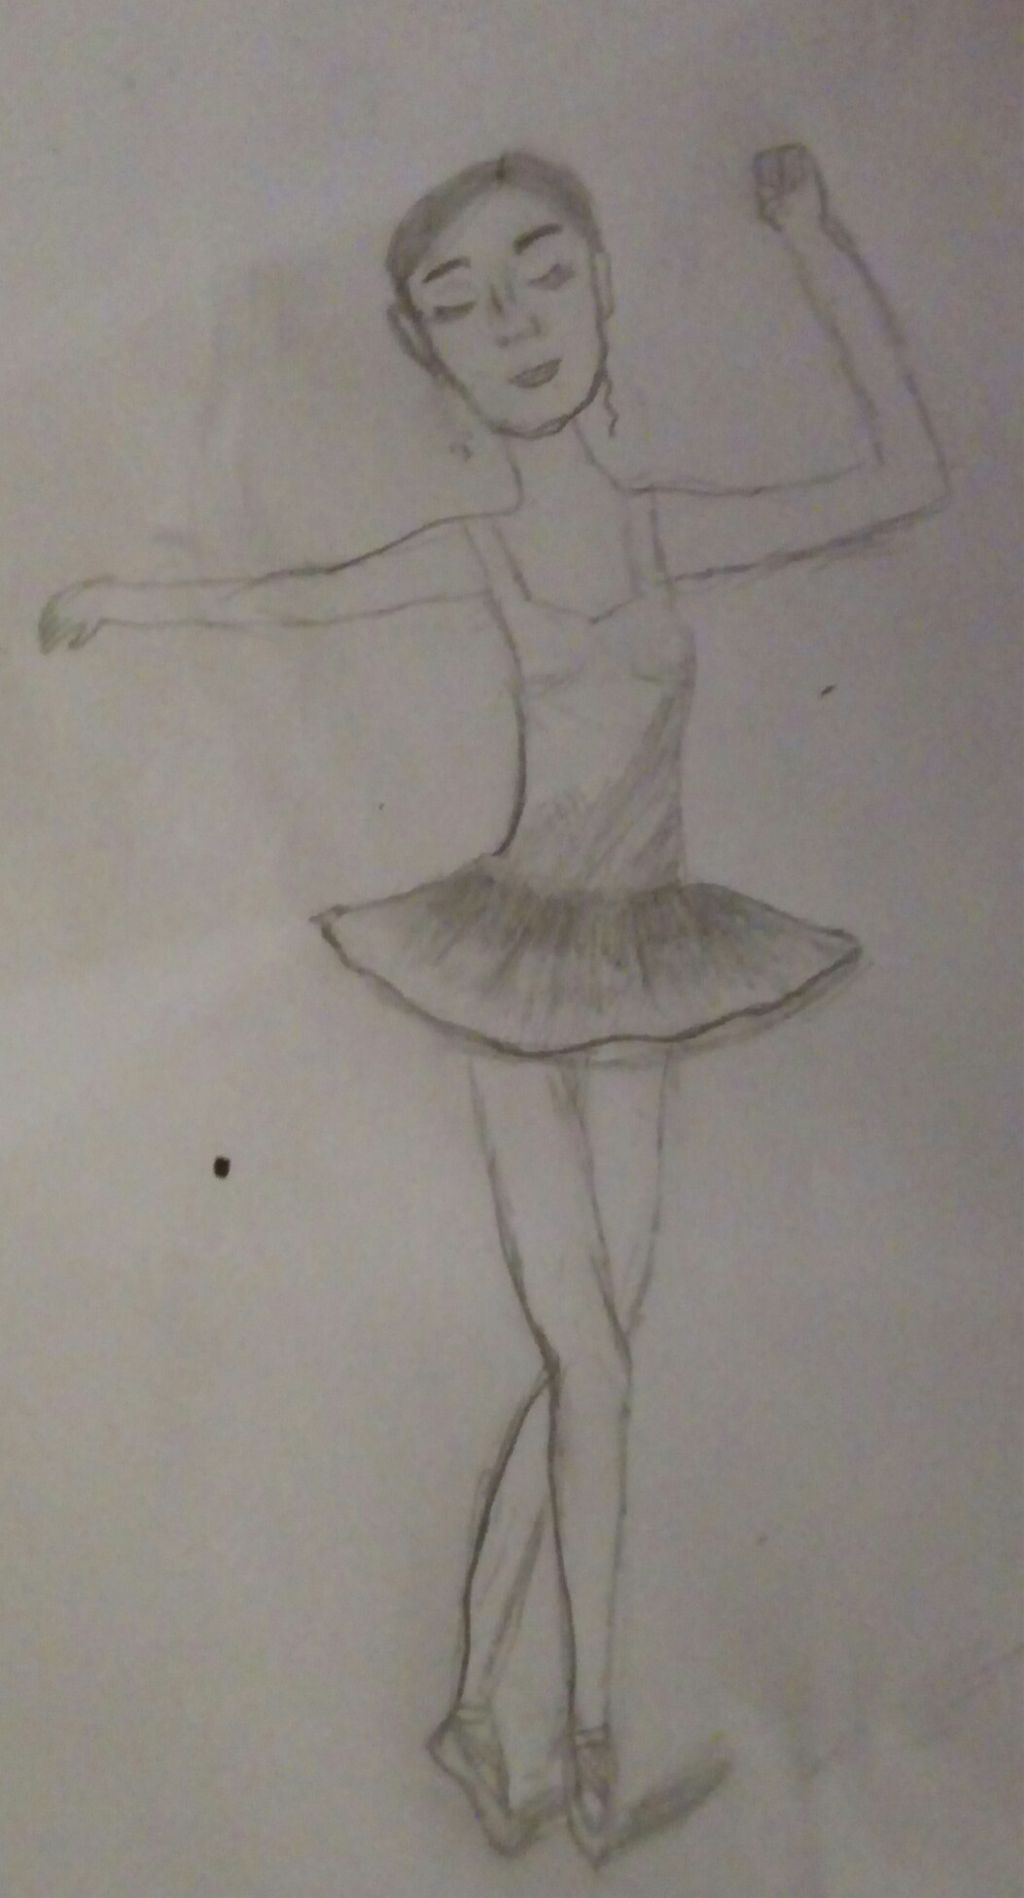 Best Bailarinas De Ballet Clasico Dibujos A Lapiz Image Collection